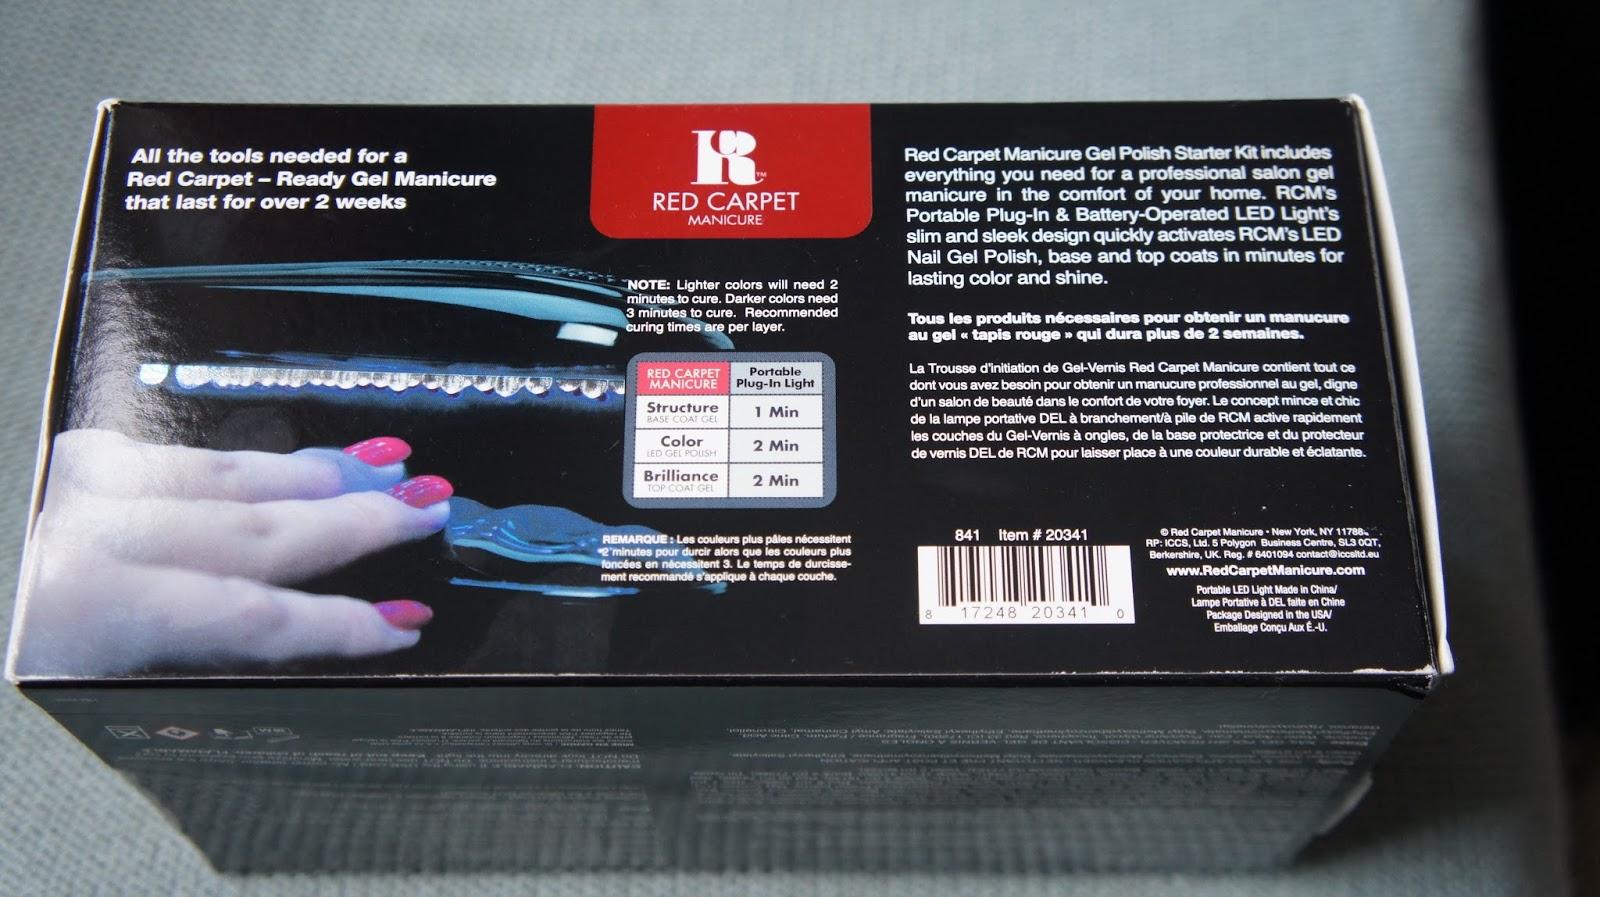 Red Carpet Manicure Kit Debenhams- HireAbility